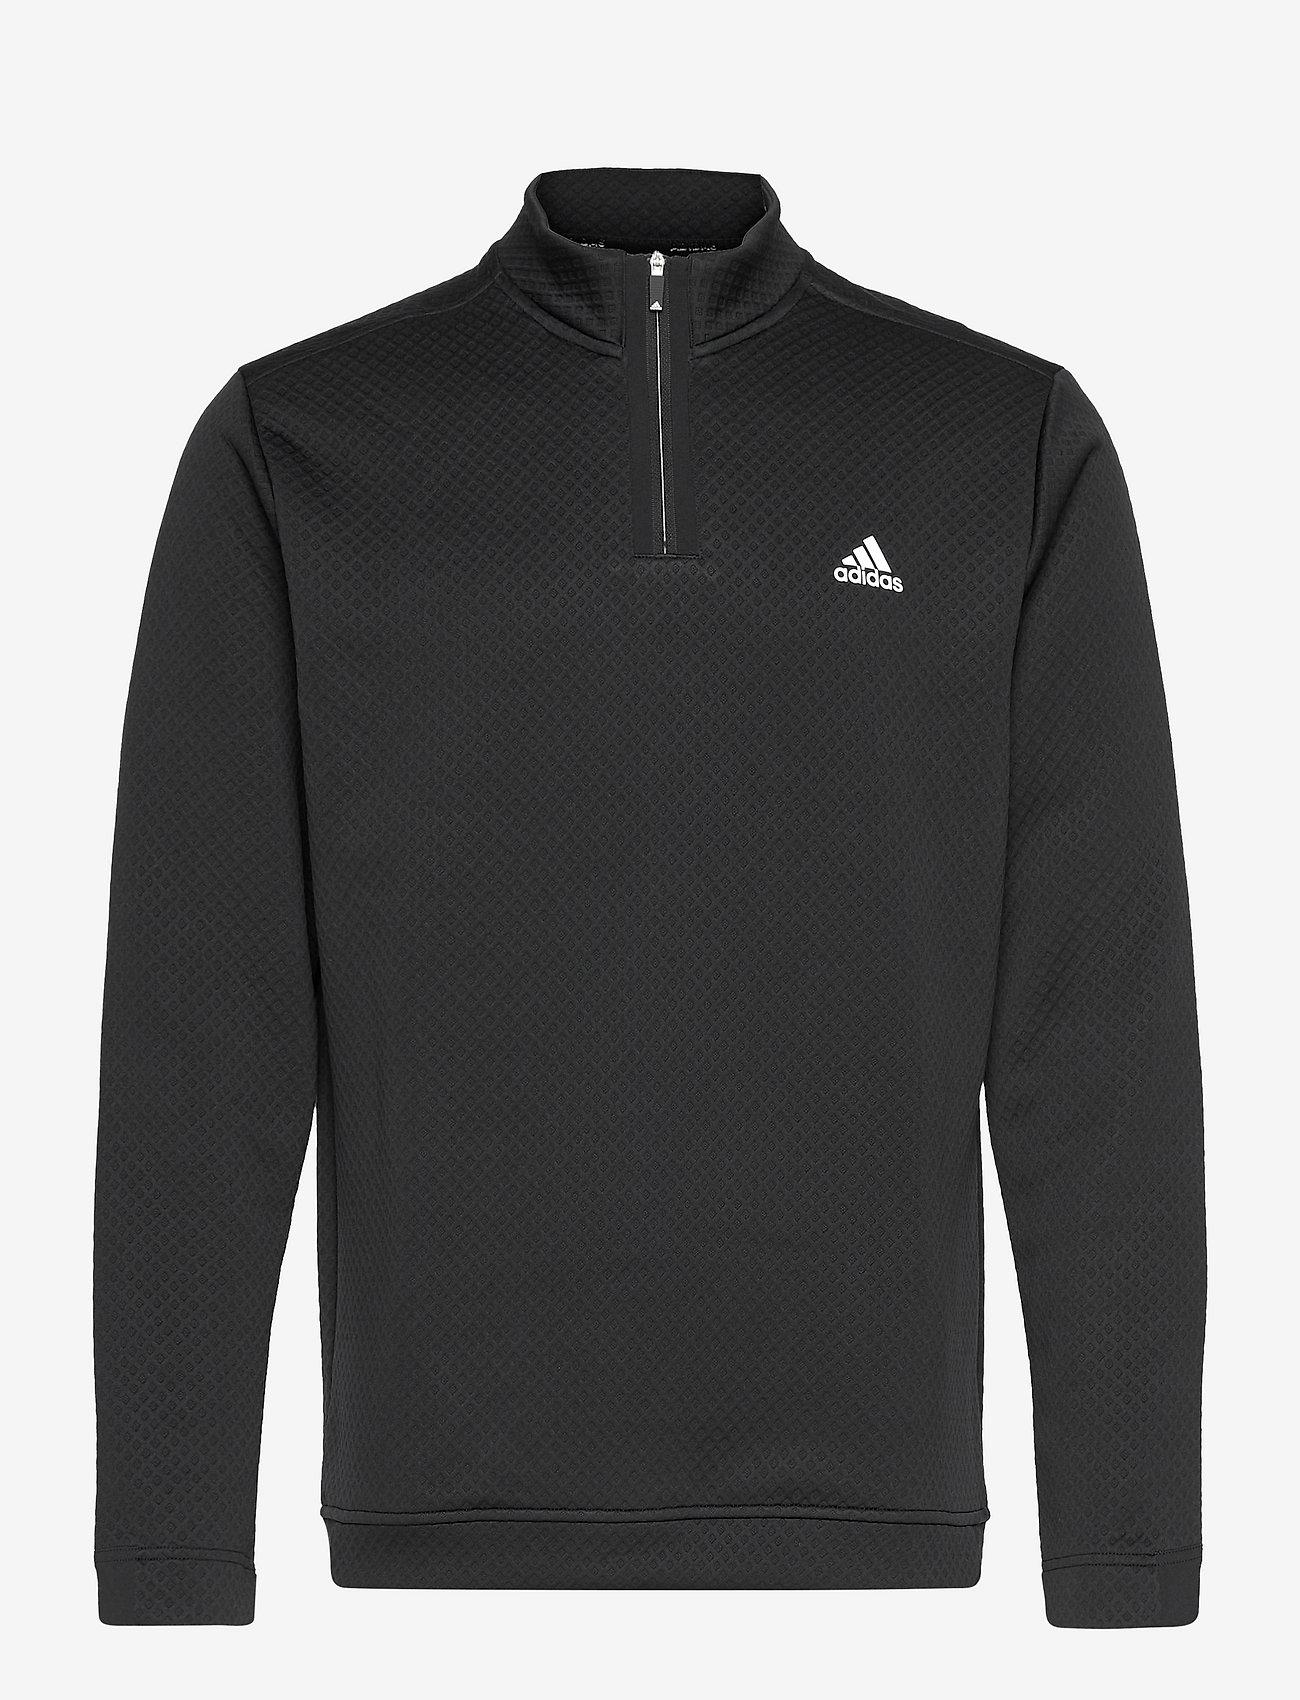 adidas Golf - DWR 1/4 ZIP - sweats - black - 1